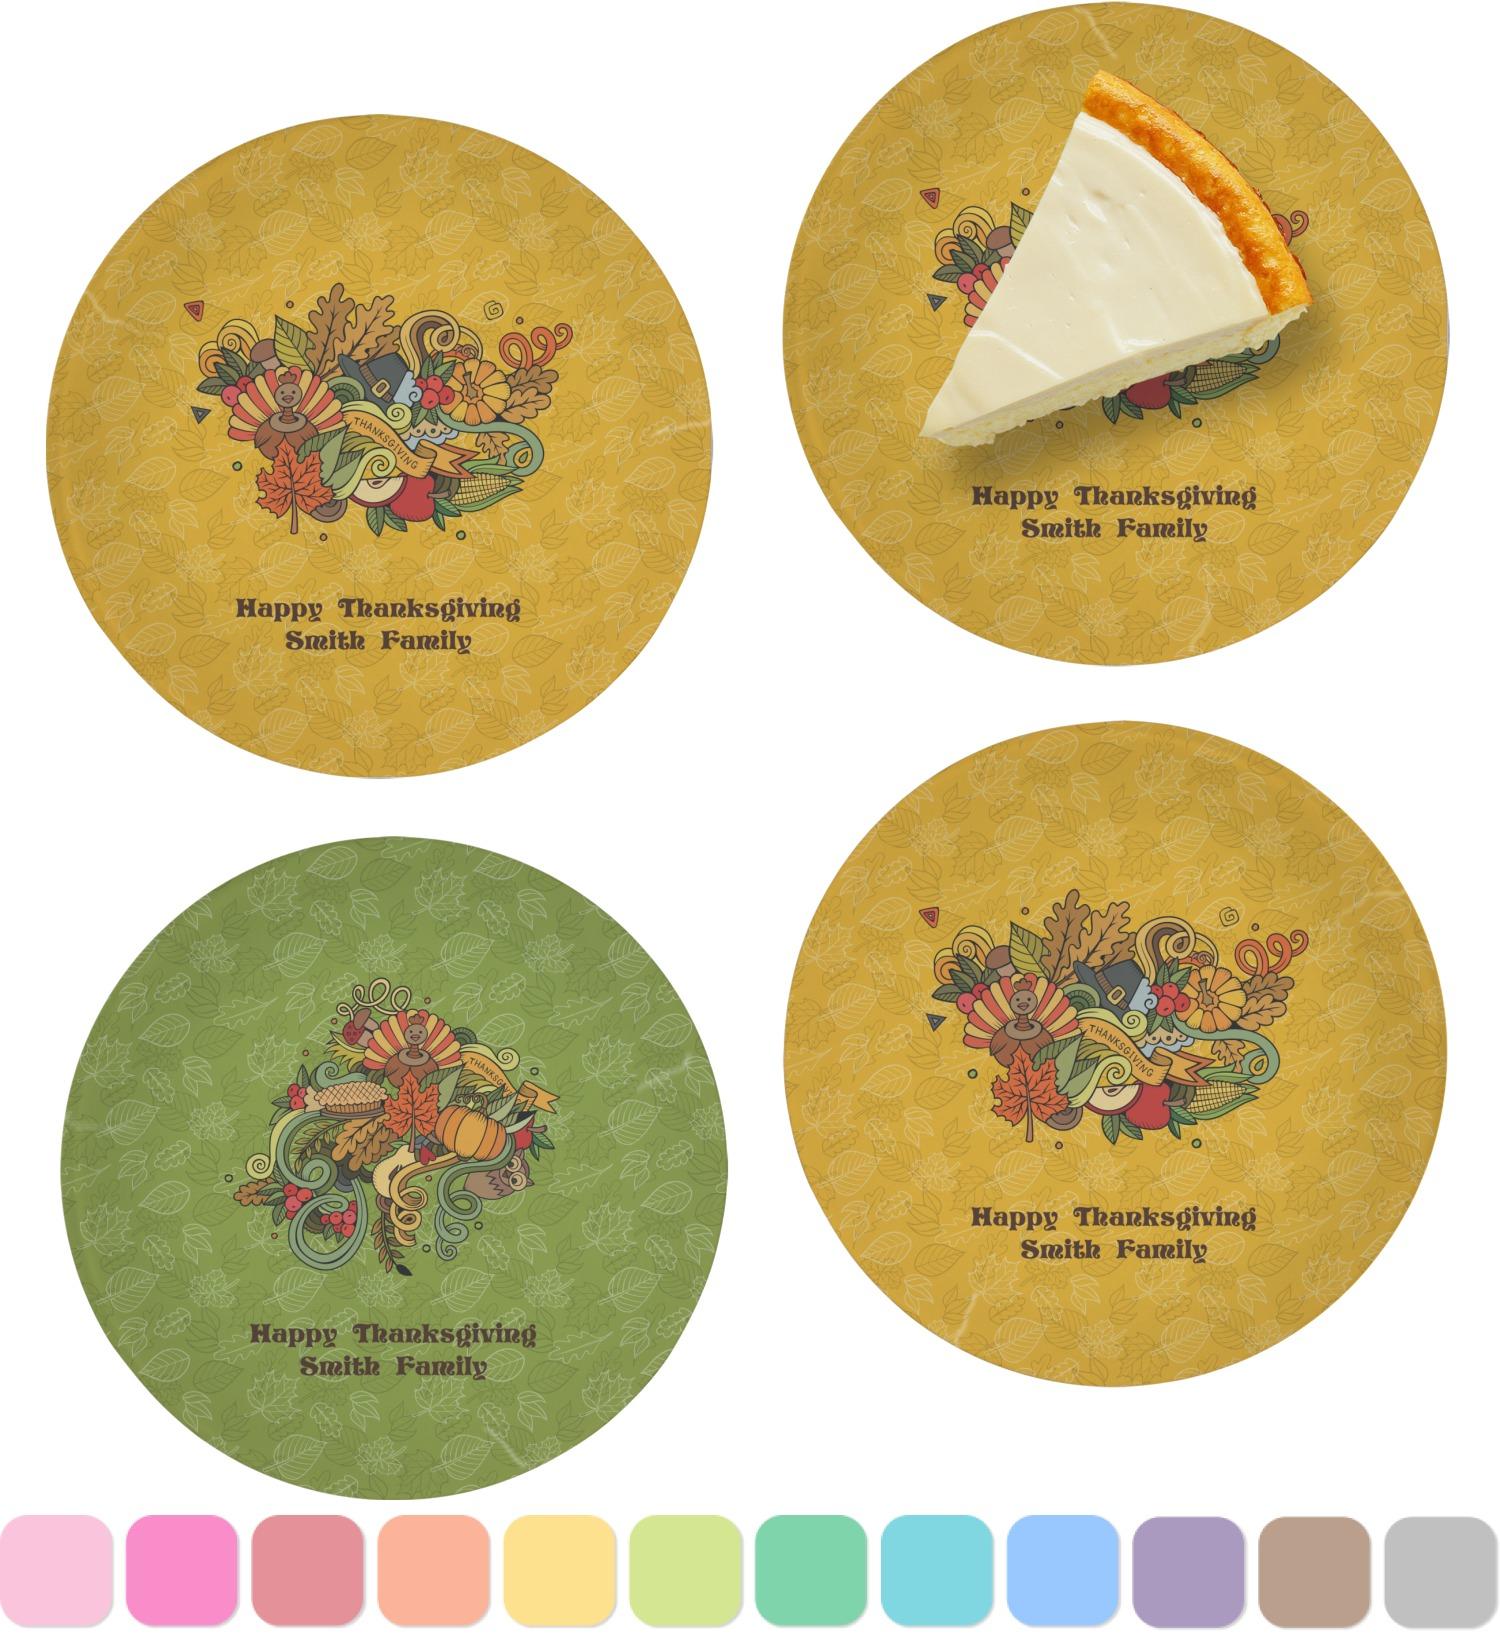 Happy Thanksgiving Set Of Appetizer Dessert Plates